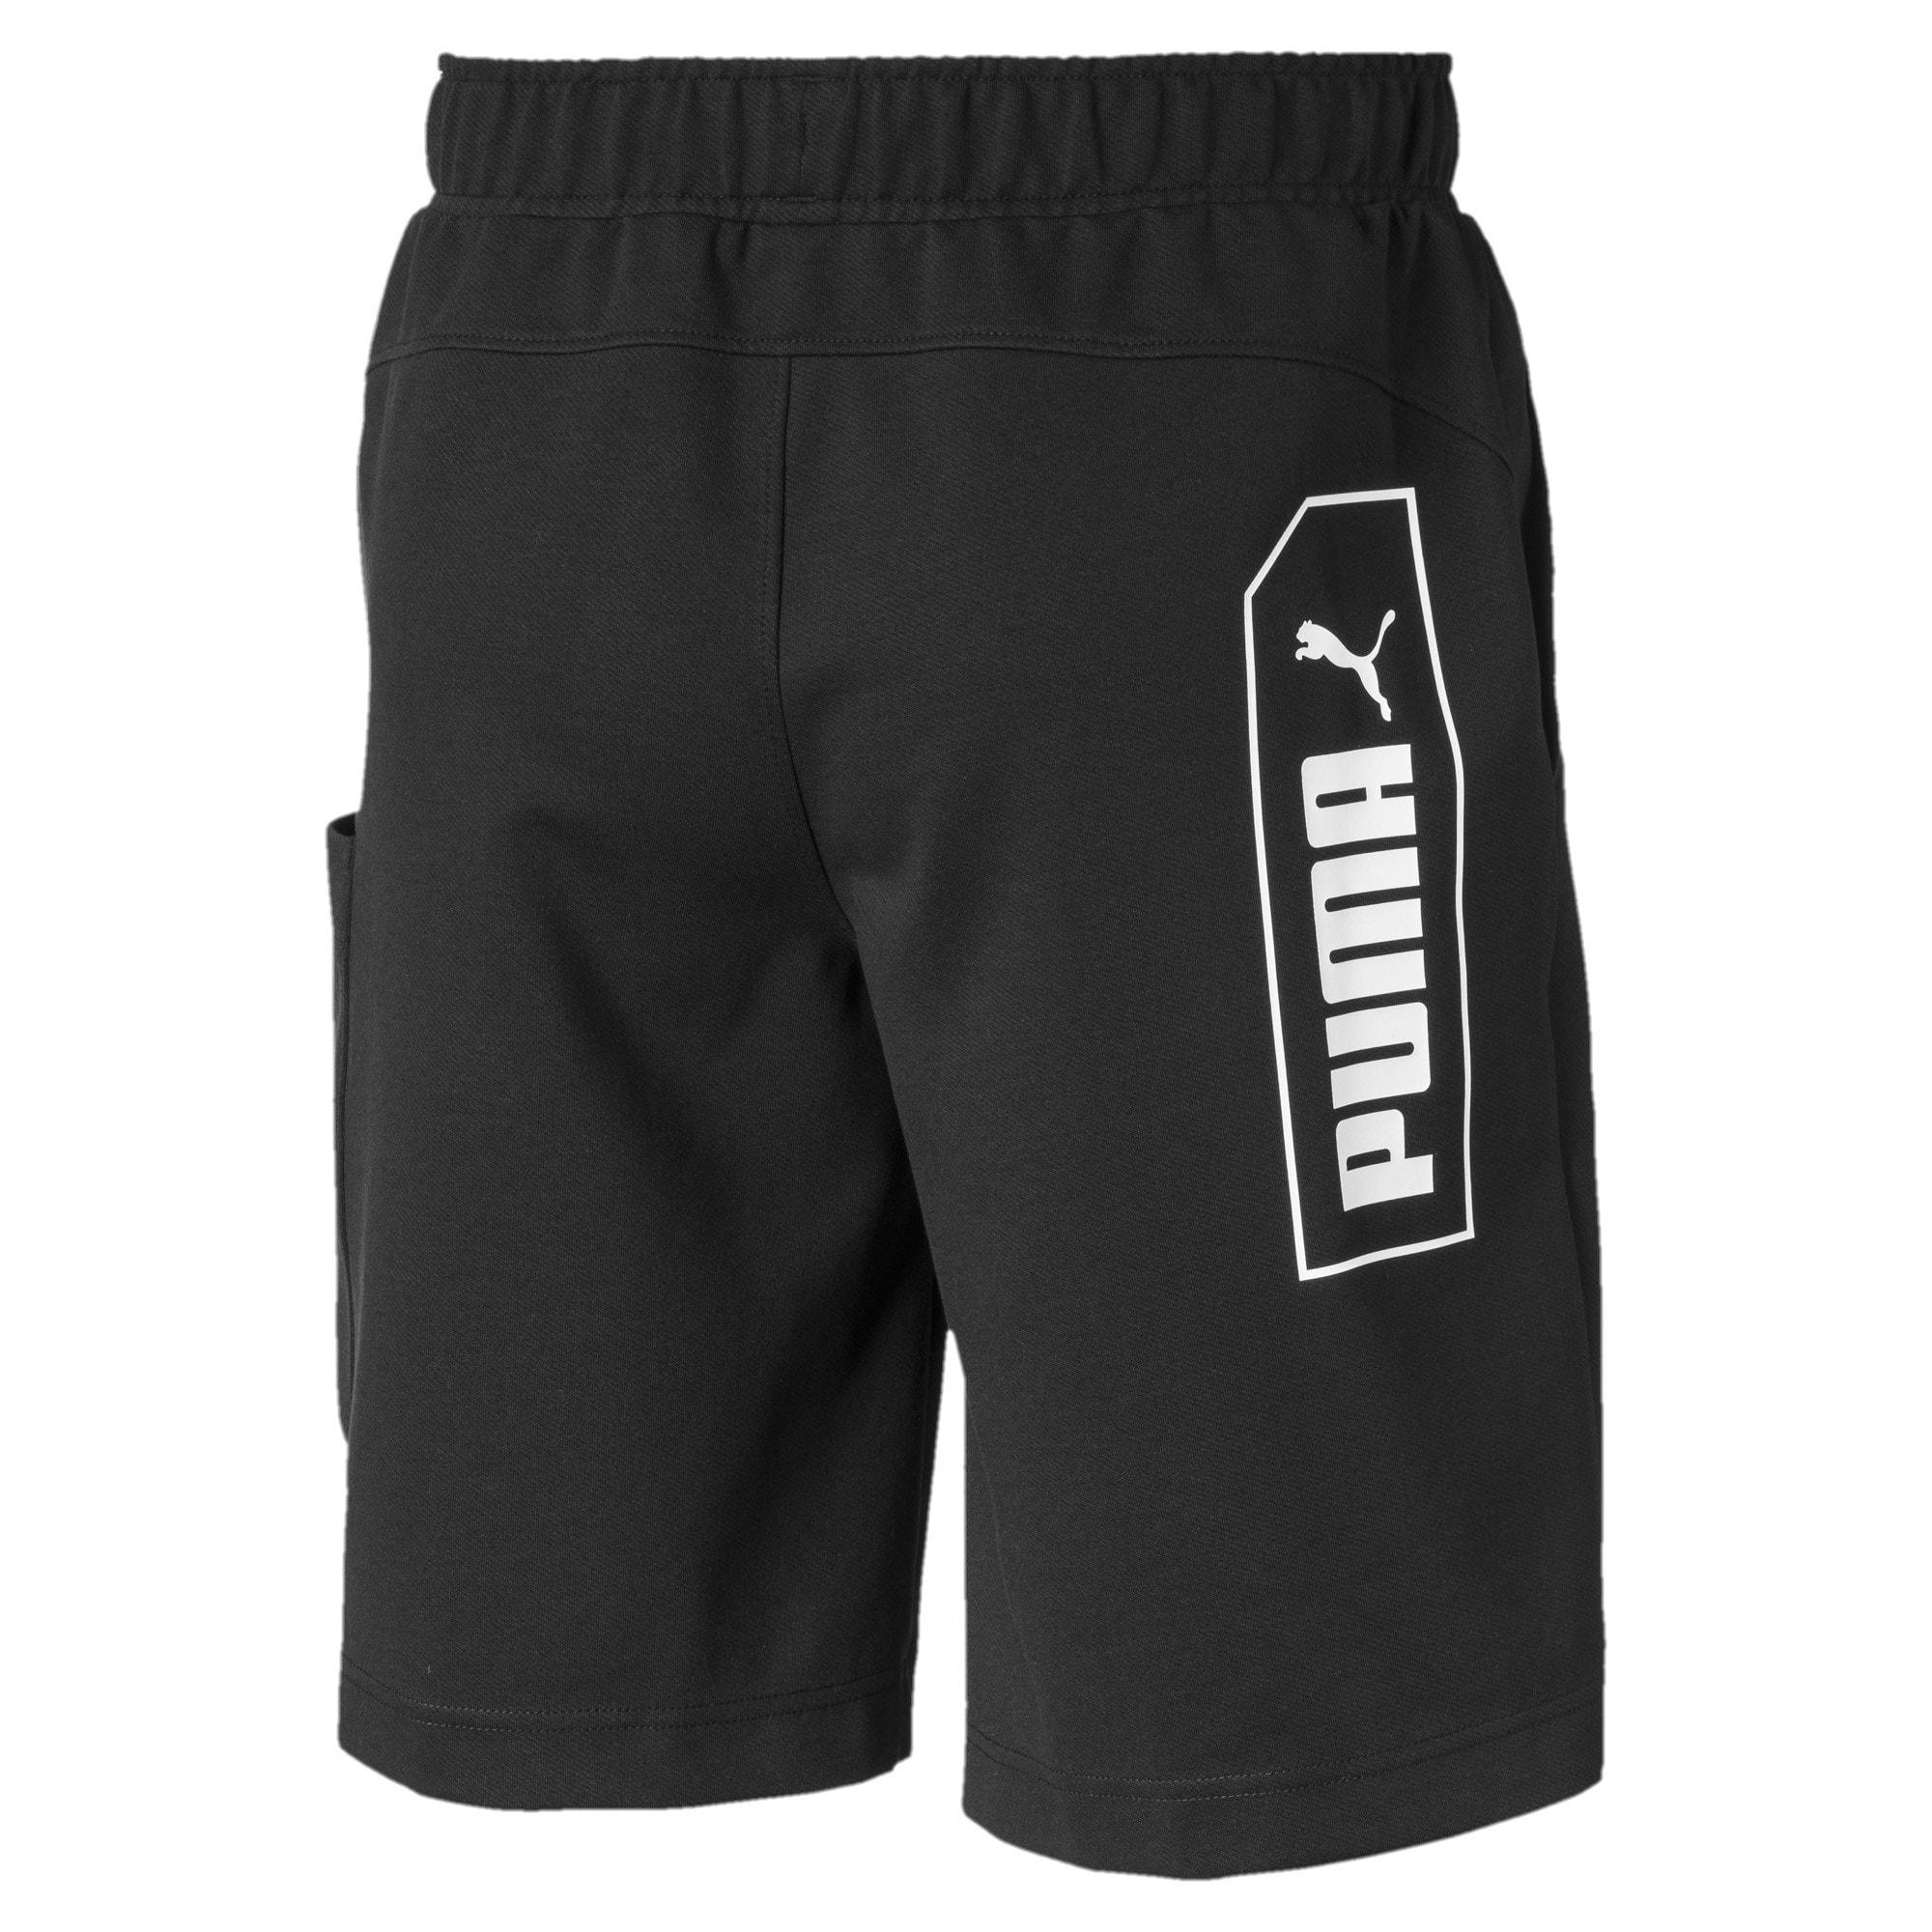 Thumbnail 5 of NU-TILITY Men's Shorts, Puma Black, medium-IND